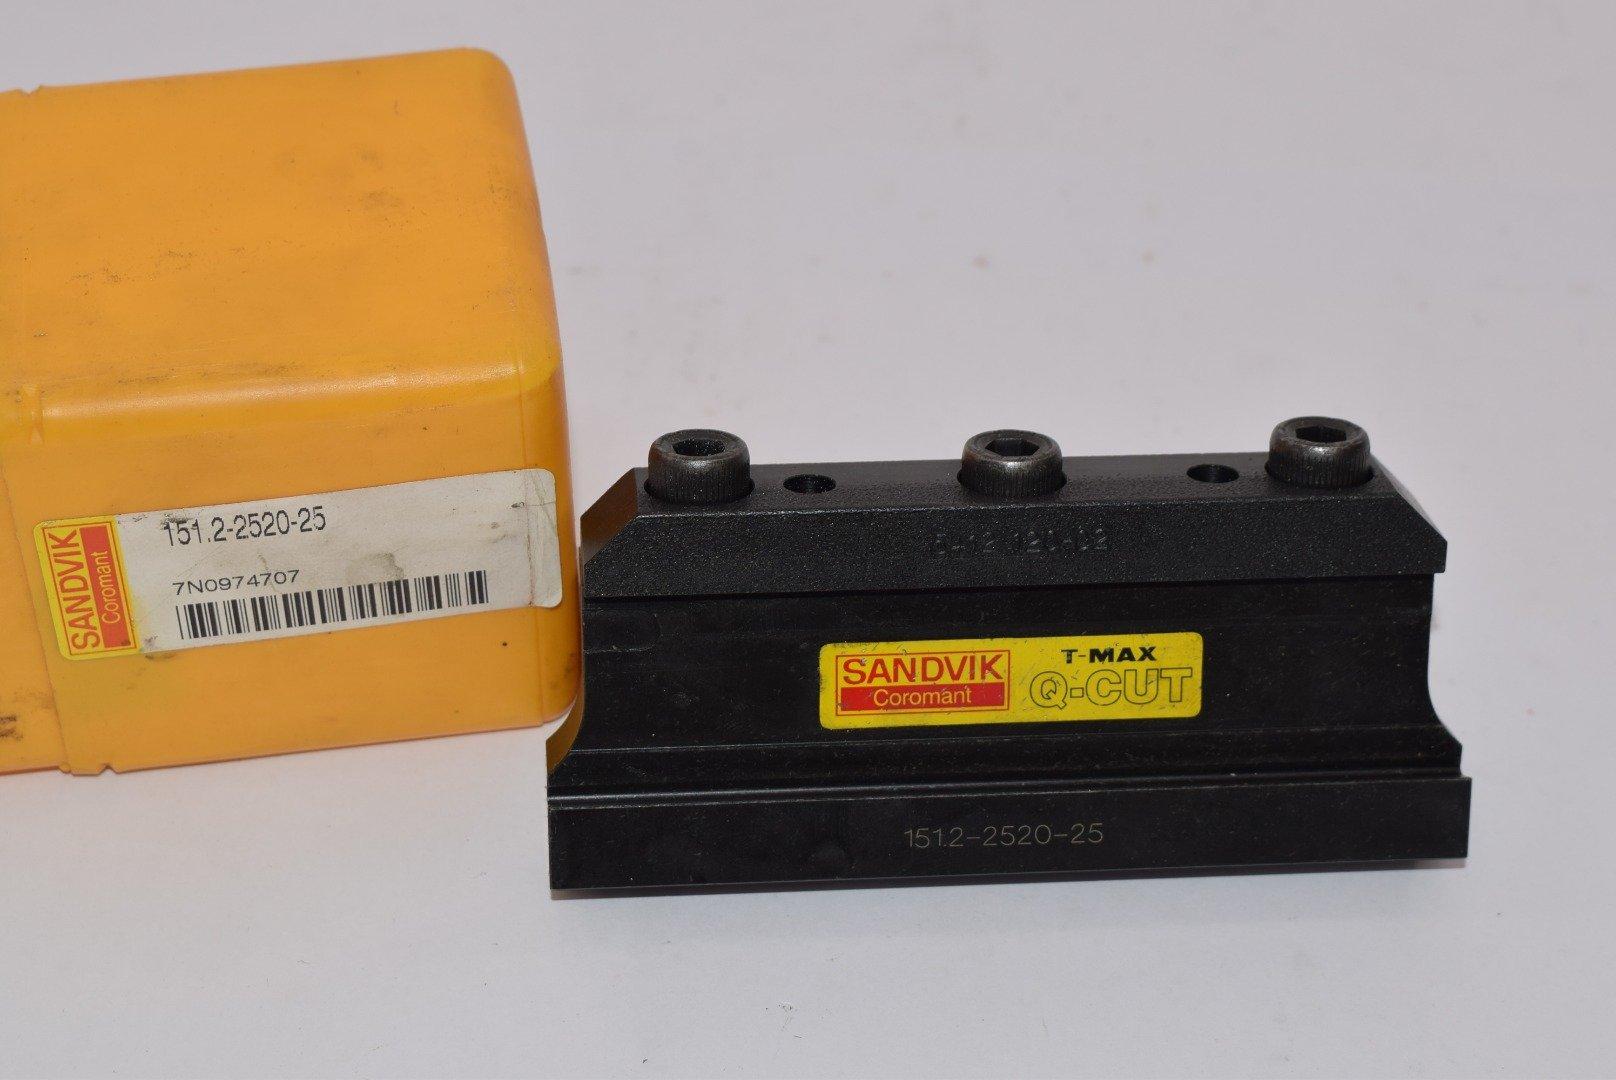 Sandvik Coromant 151.2-2520-25, Steel Tool block for blades, Neutral Cut